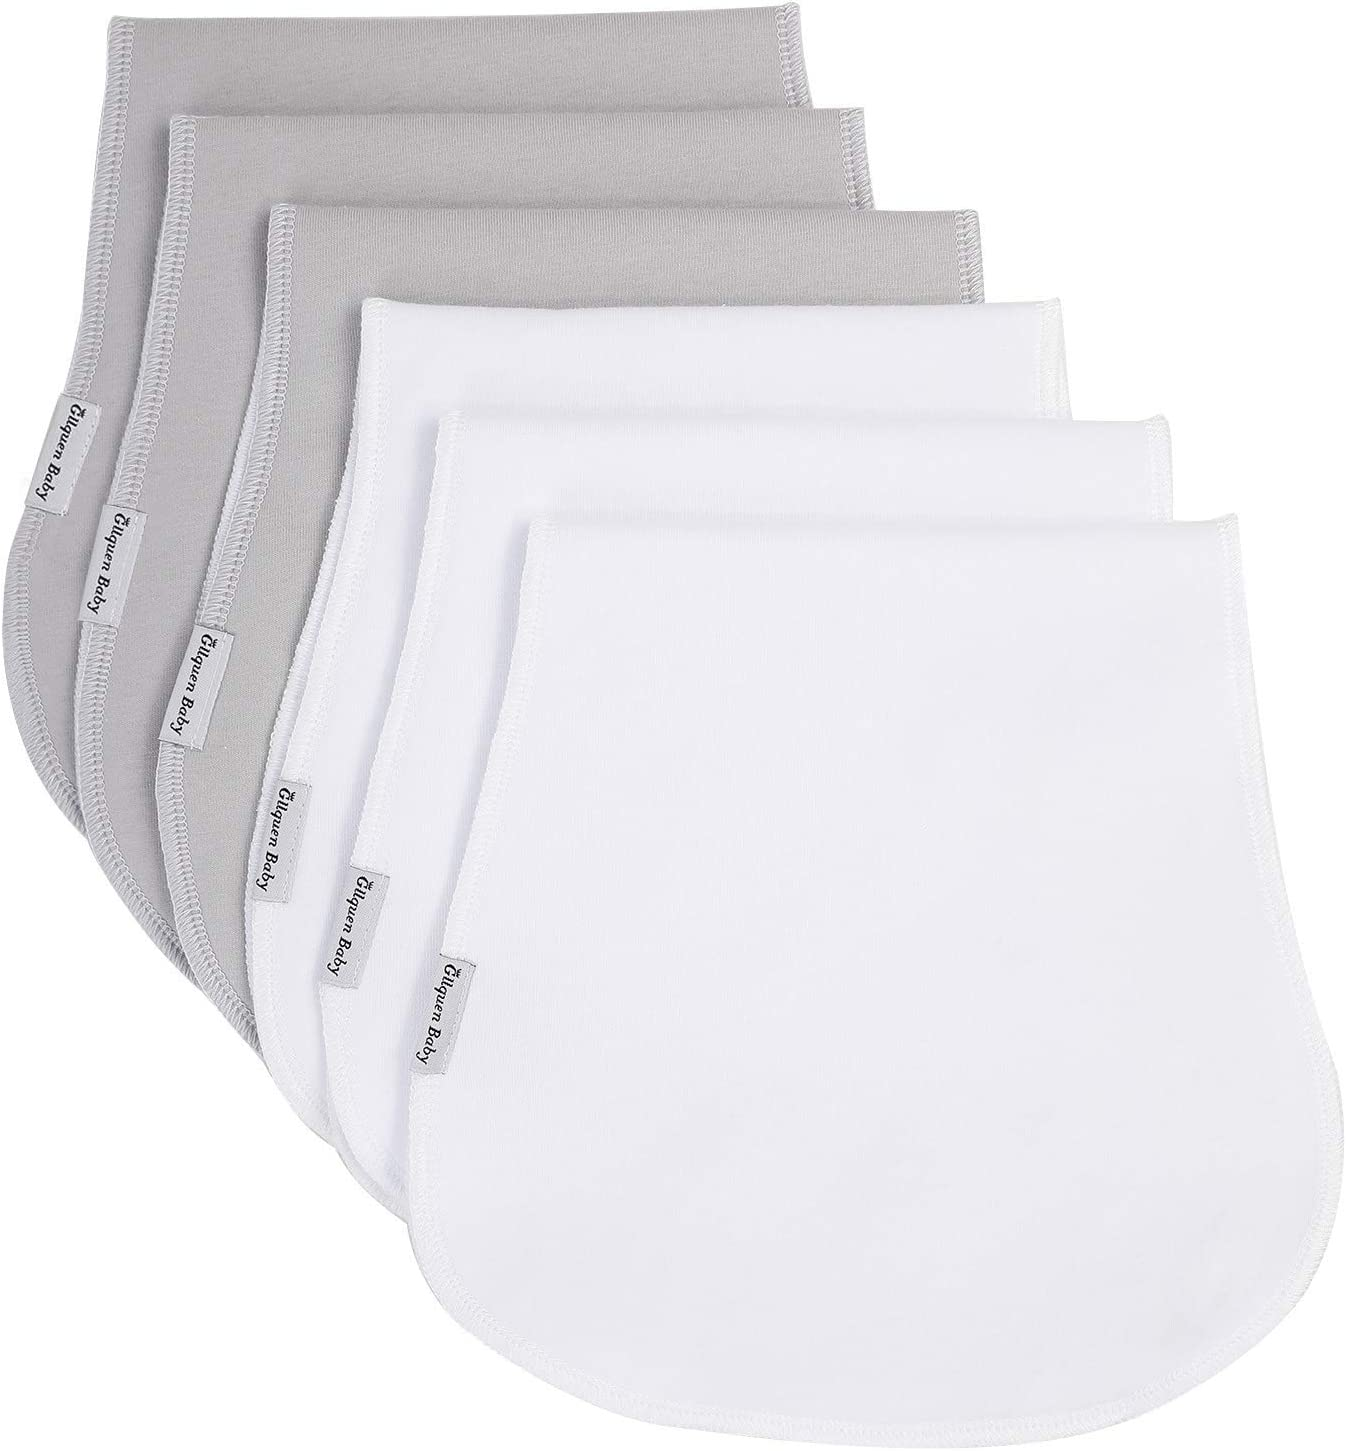 Baby Burp Cloth - [Alternative dealer] 6 Absorbent Soft Packs Burping Towels Max 46% OFF